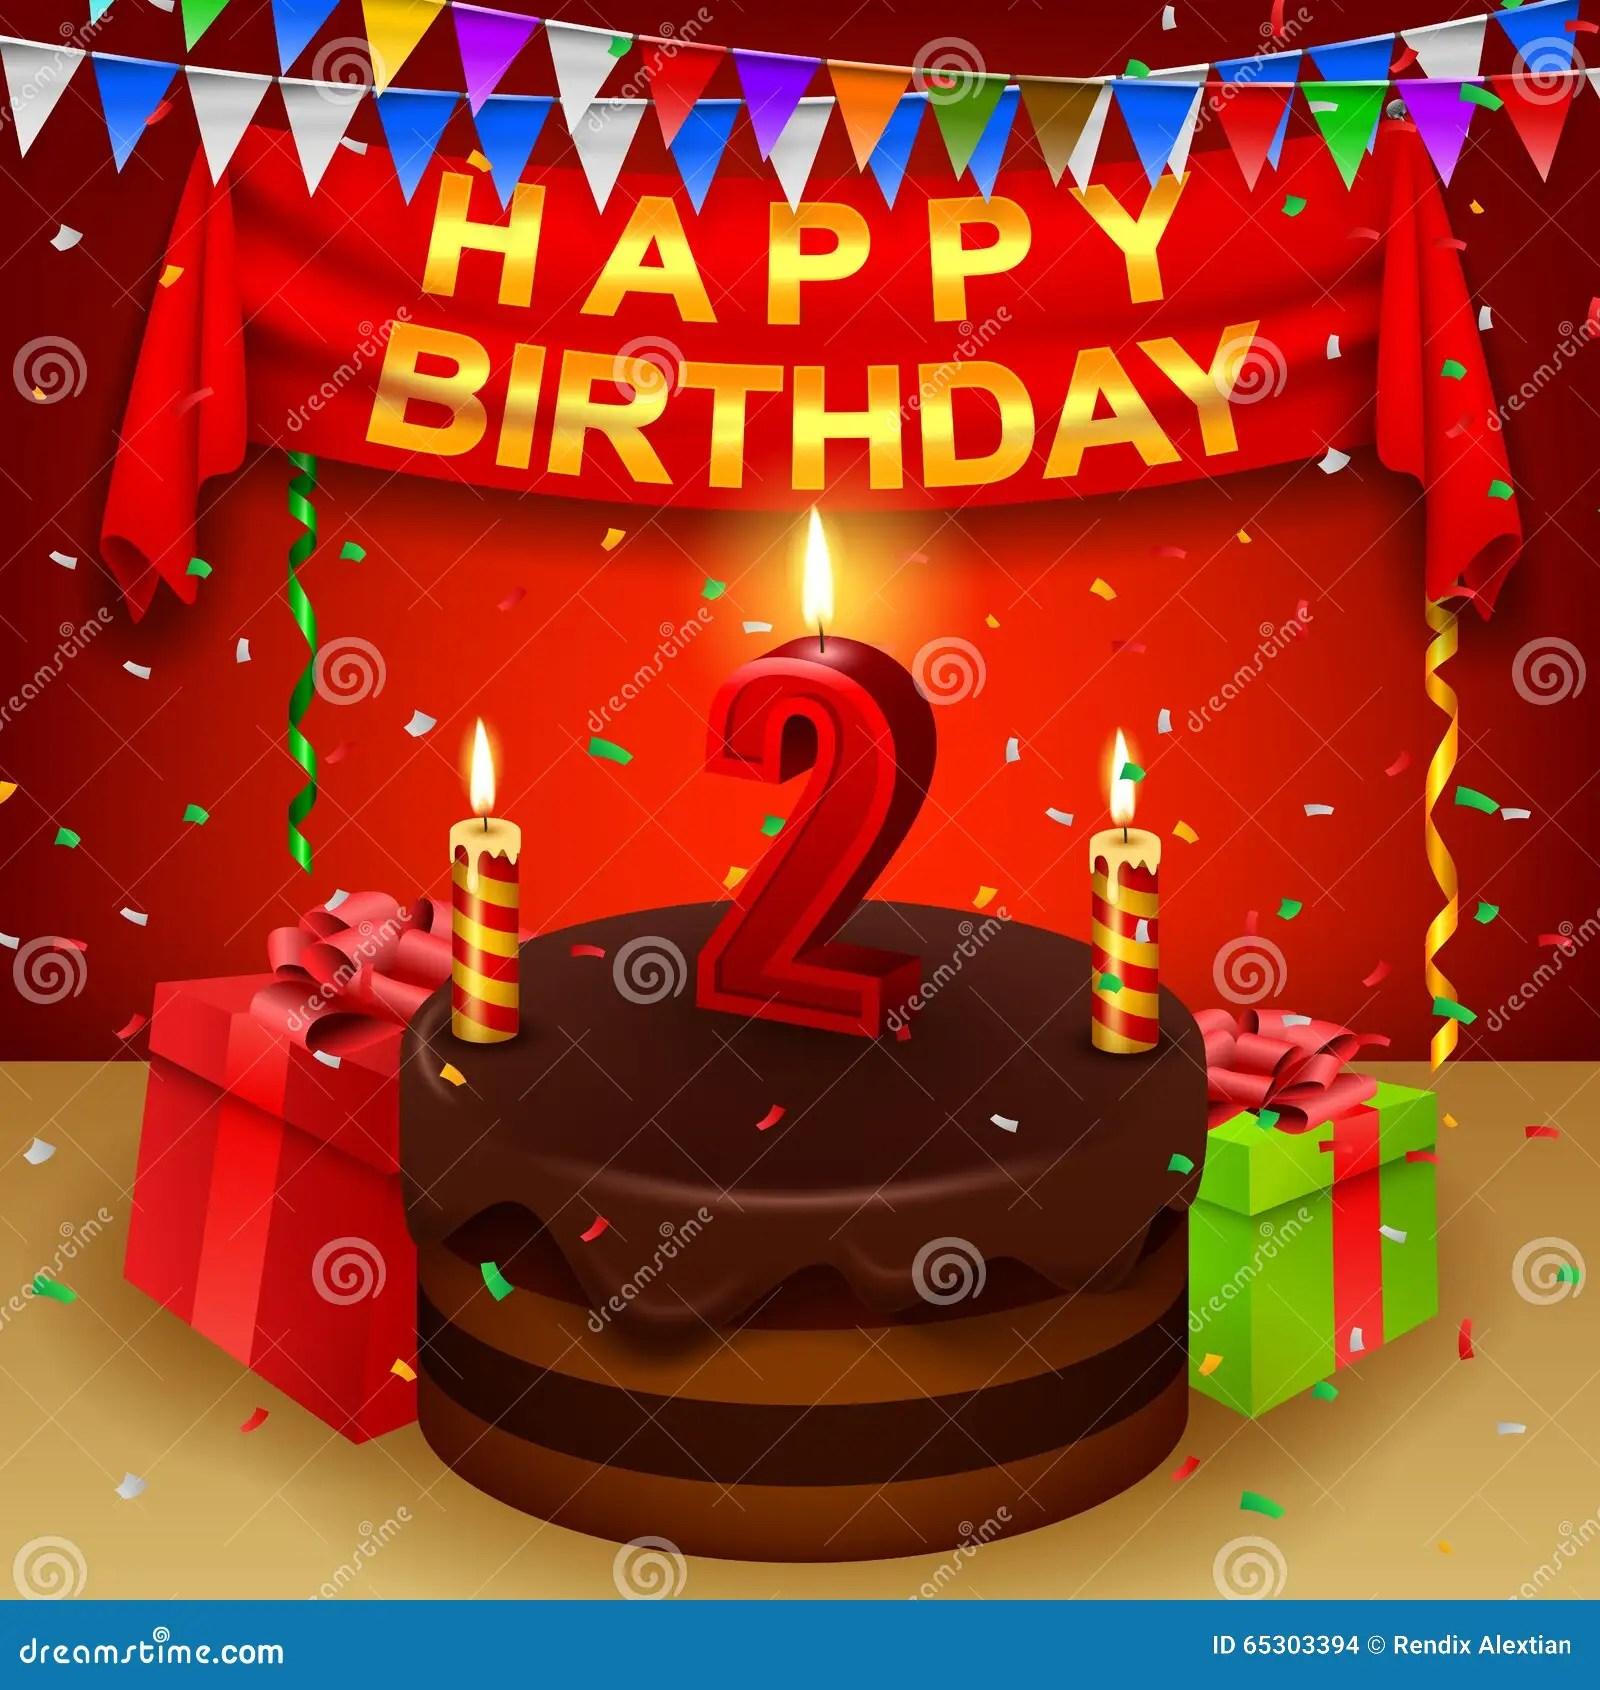 Happy 2nd Birthday With Chocolate Cream Cake And Triangular Flag Stock Vector Illustration Of Bake Cream 65303394